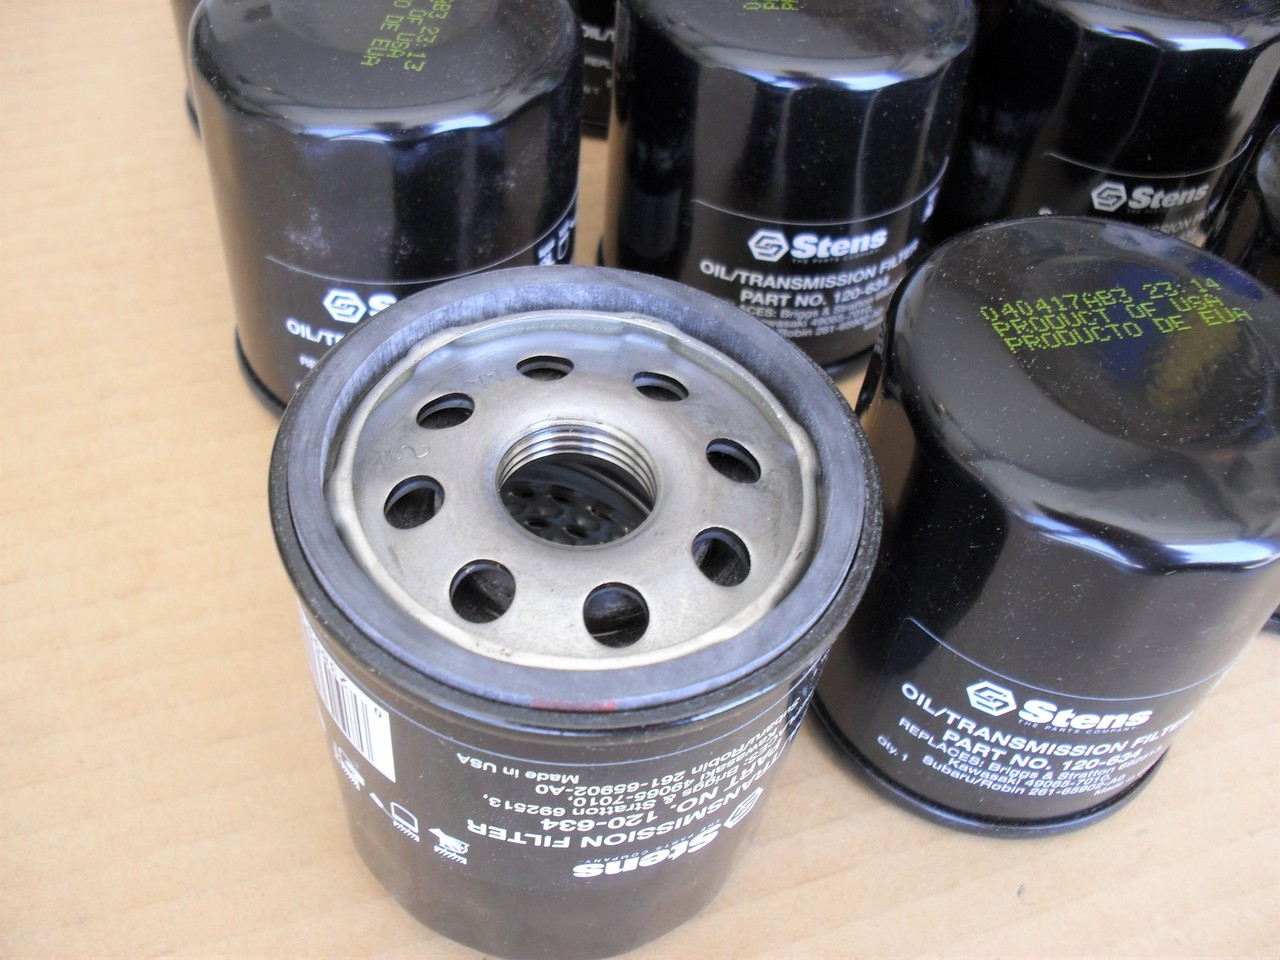 OIL FILTER for Kawasaki 49065-2057 49065-2062 49065-2078 49065-2084 Lesco 014888